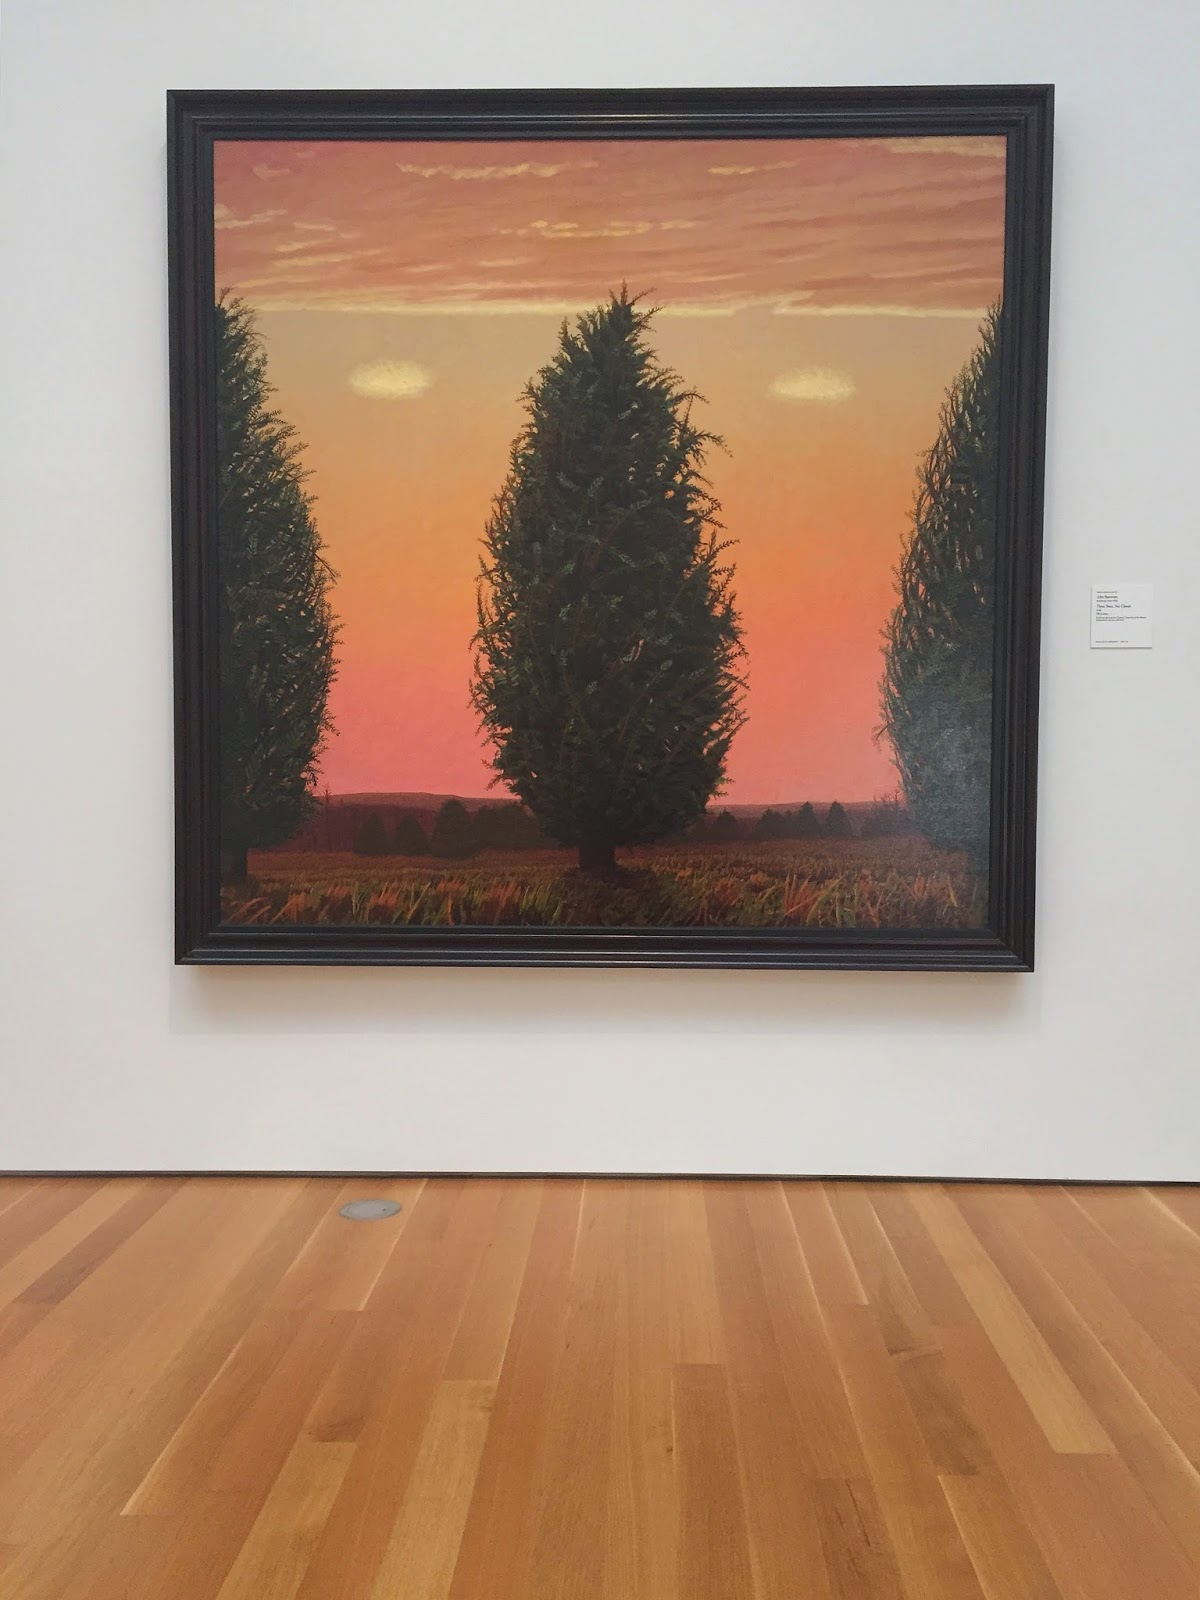 Three Trees Two Clouds, John Beerman, oil on linen, North Carolina Museum of Art, NCMA, Raleigh, North Carolina, things to do in Raleigh, things to go in North Carolina, art, art museum